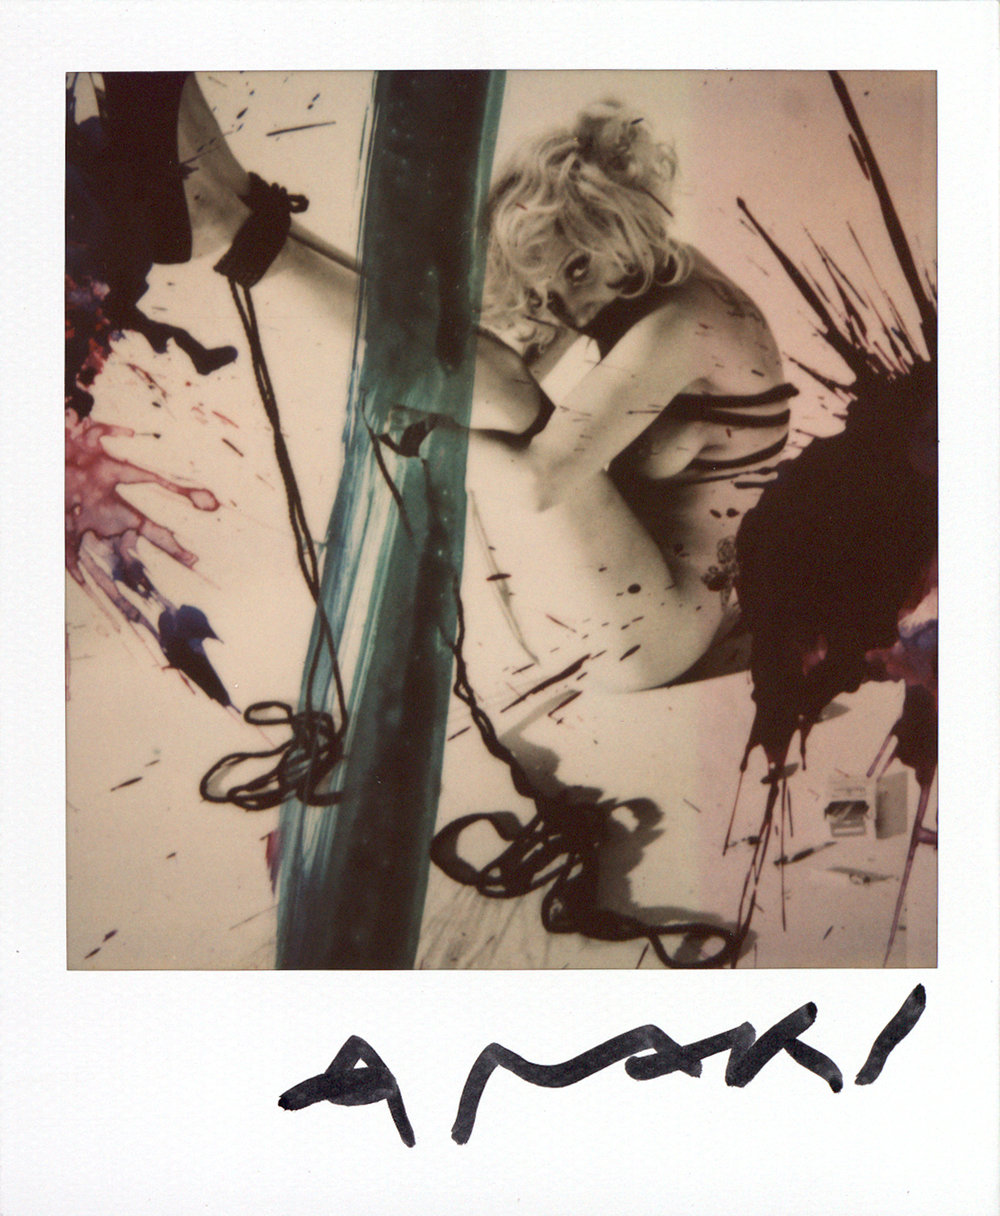 Nobuyoshi Araki  Lady Gaga  2009  Polaroid SX-70  © Nobuyoshi Araki, Courtesy Fotosammlung OstLicht